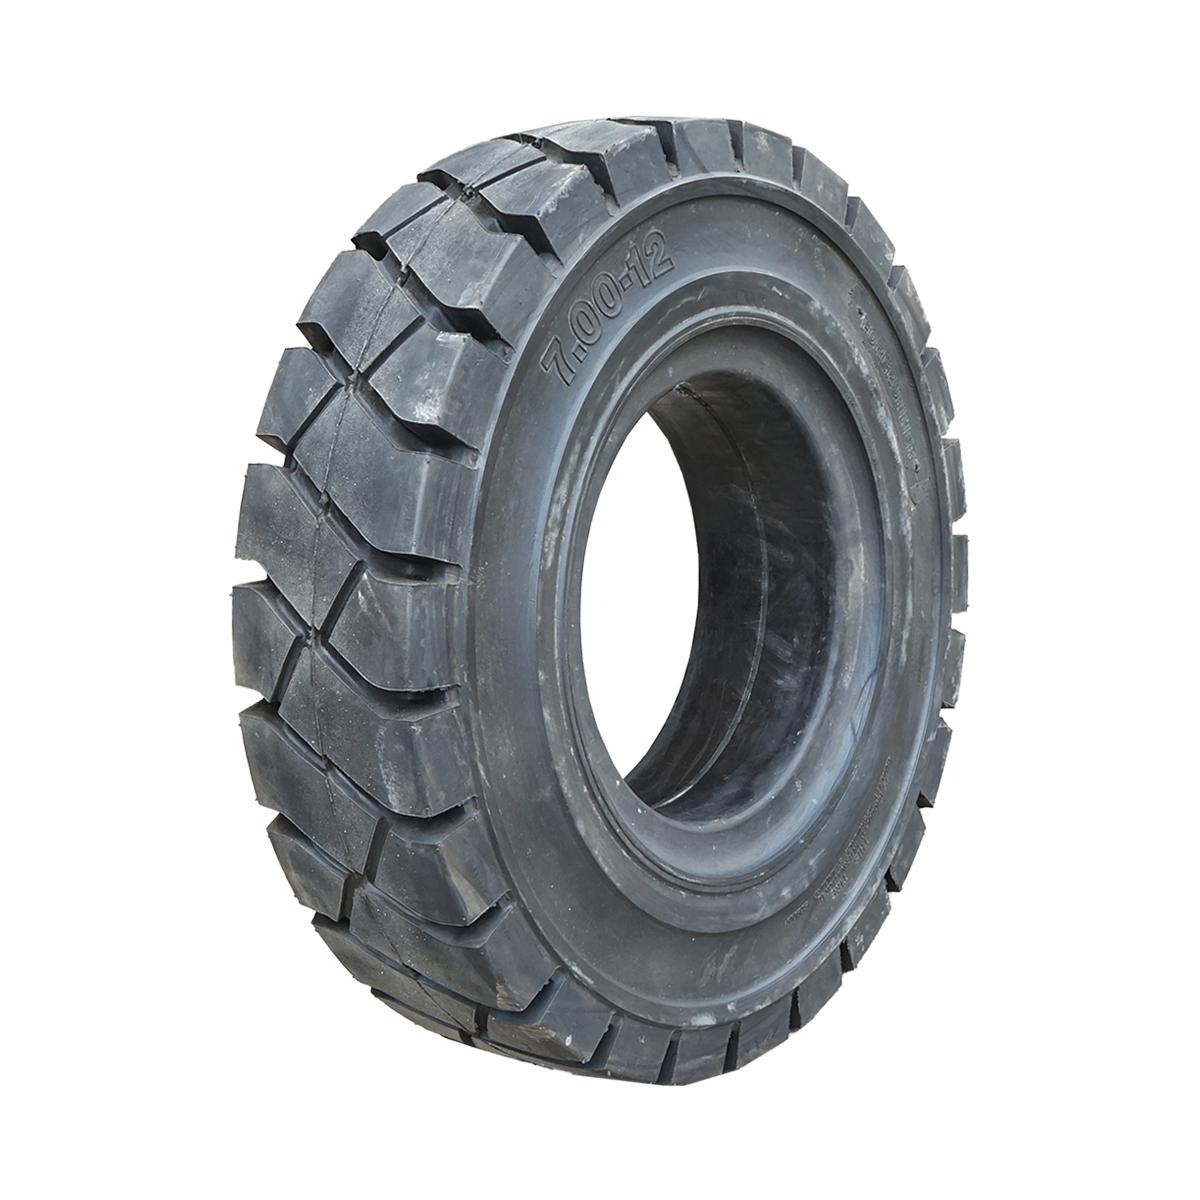 Anvelopa industriala 700/12 solida QH304 JT301